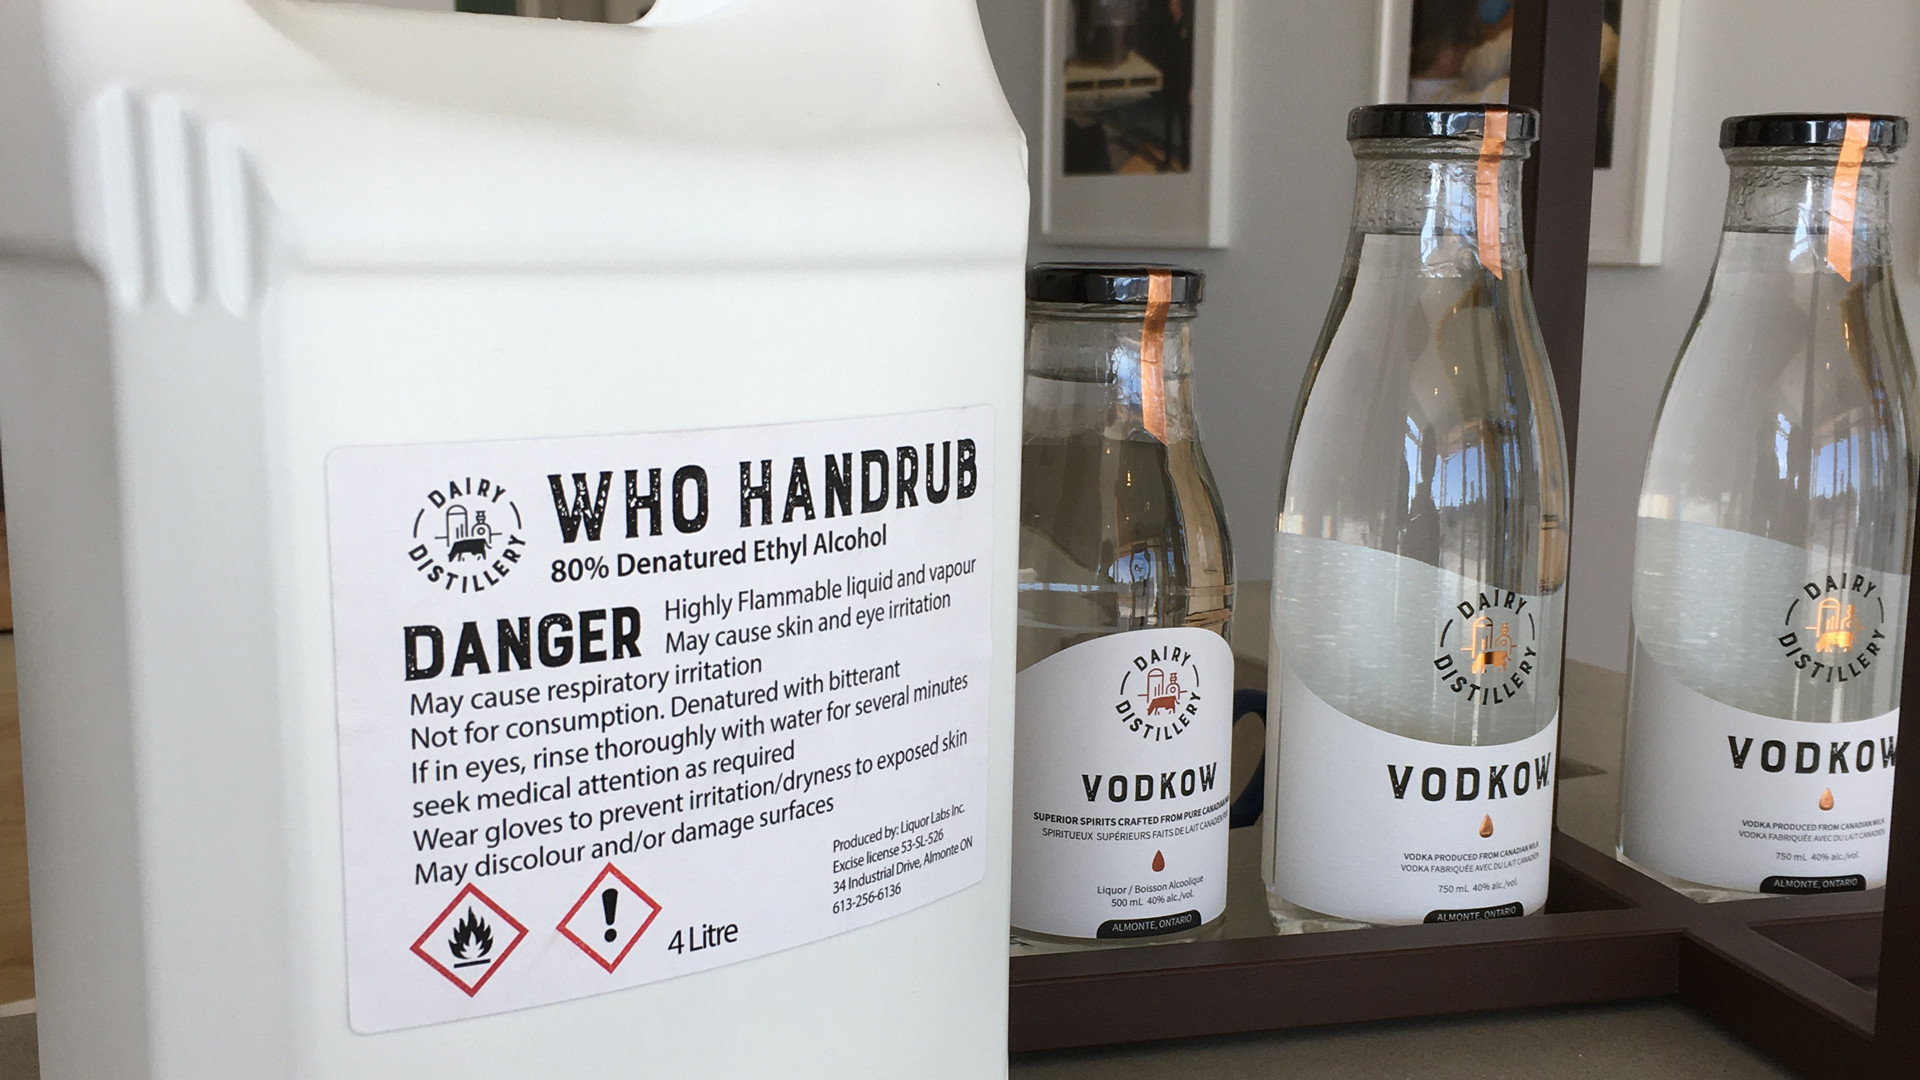 Vodkow, local, sustainable vodka distillery